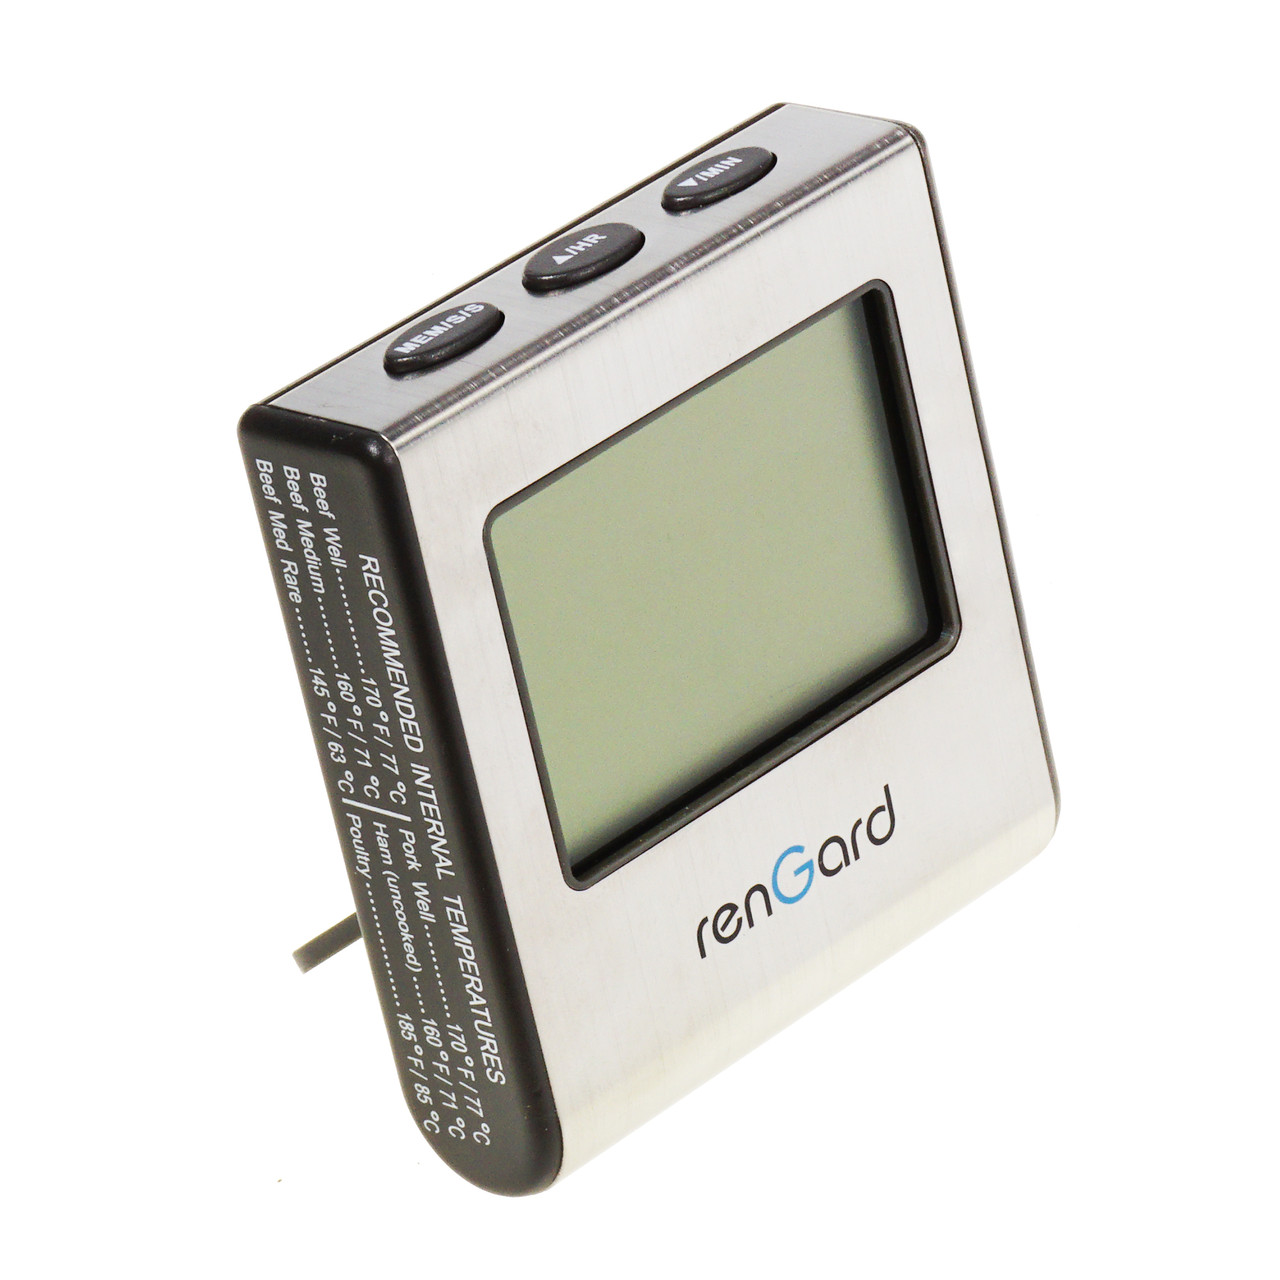 Электронный термометр для мяса RenGard RG-16